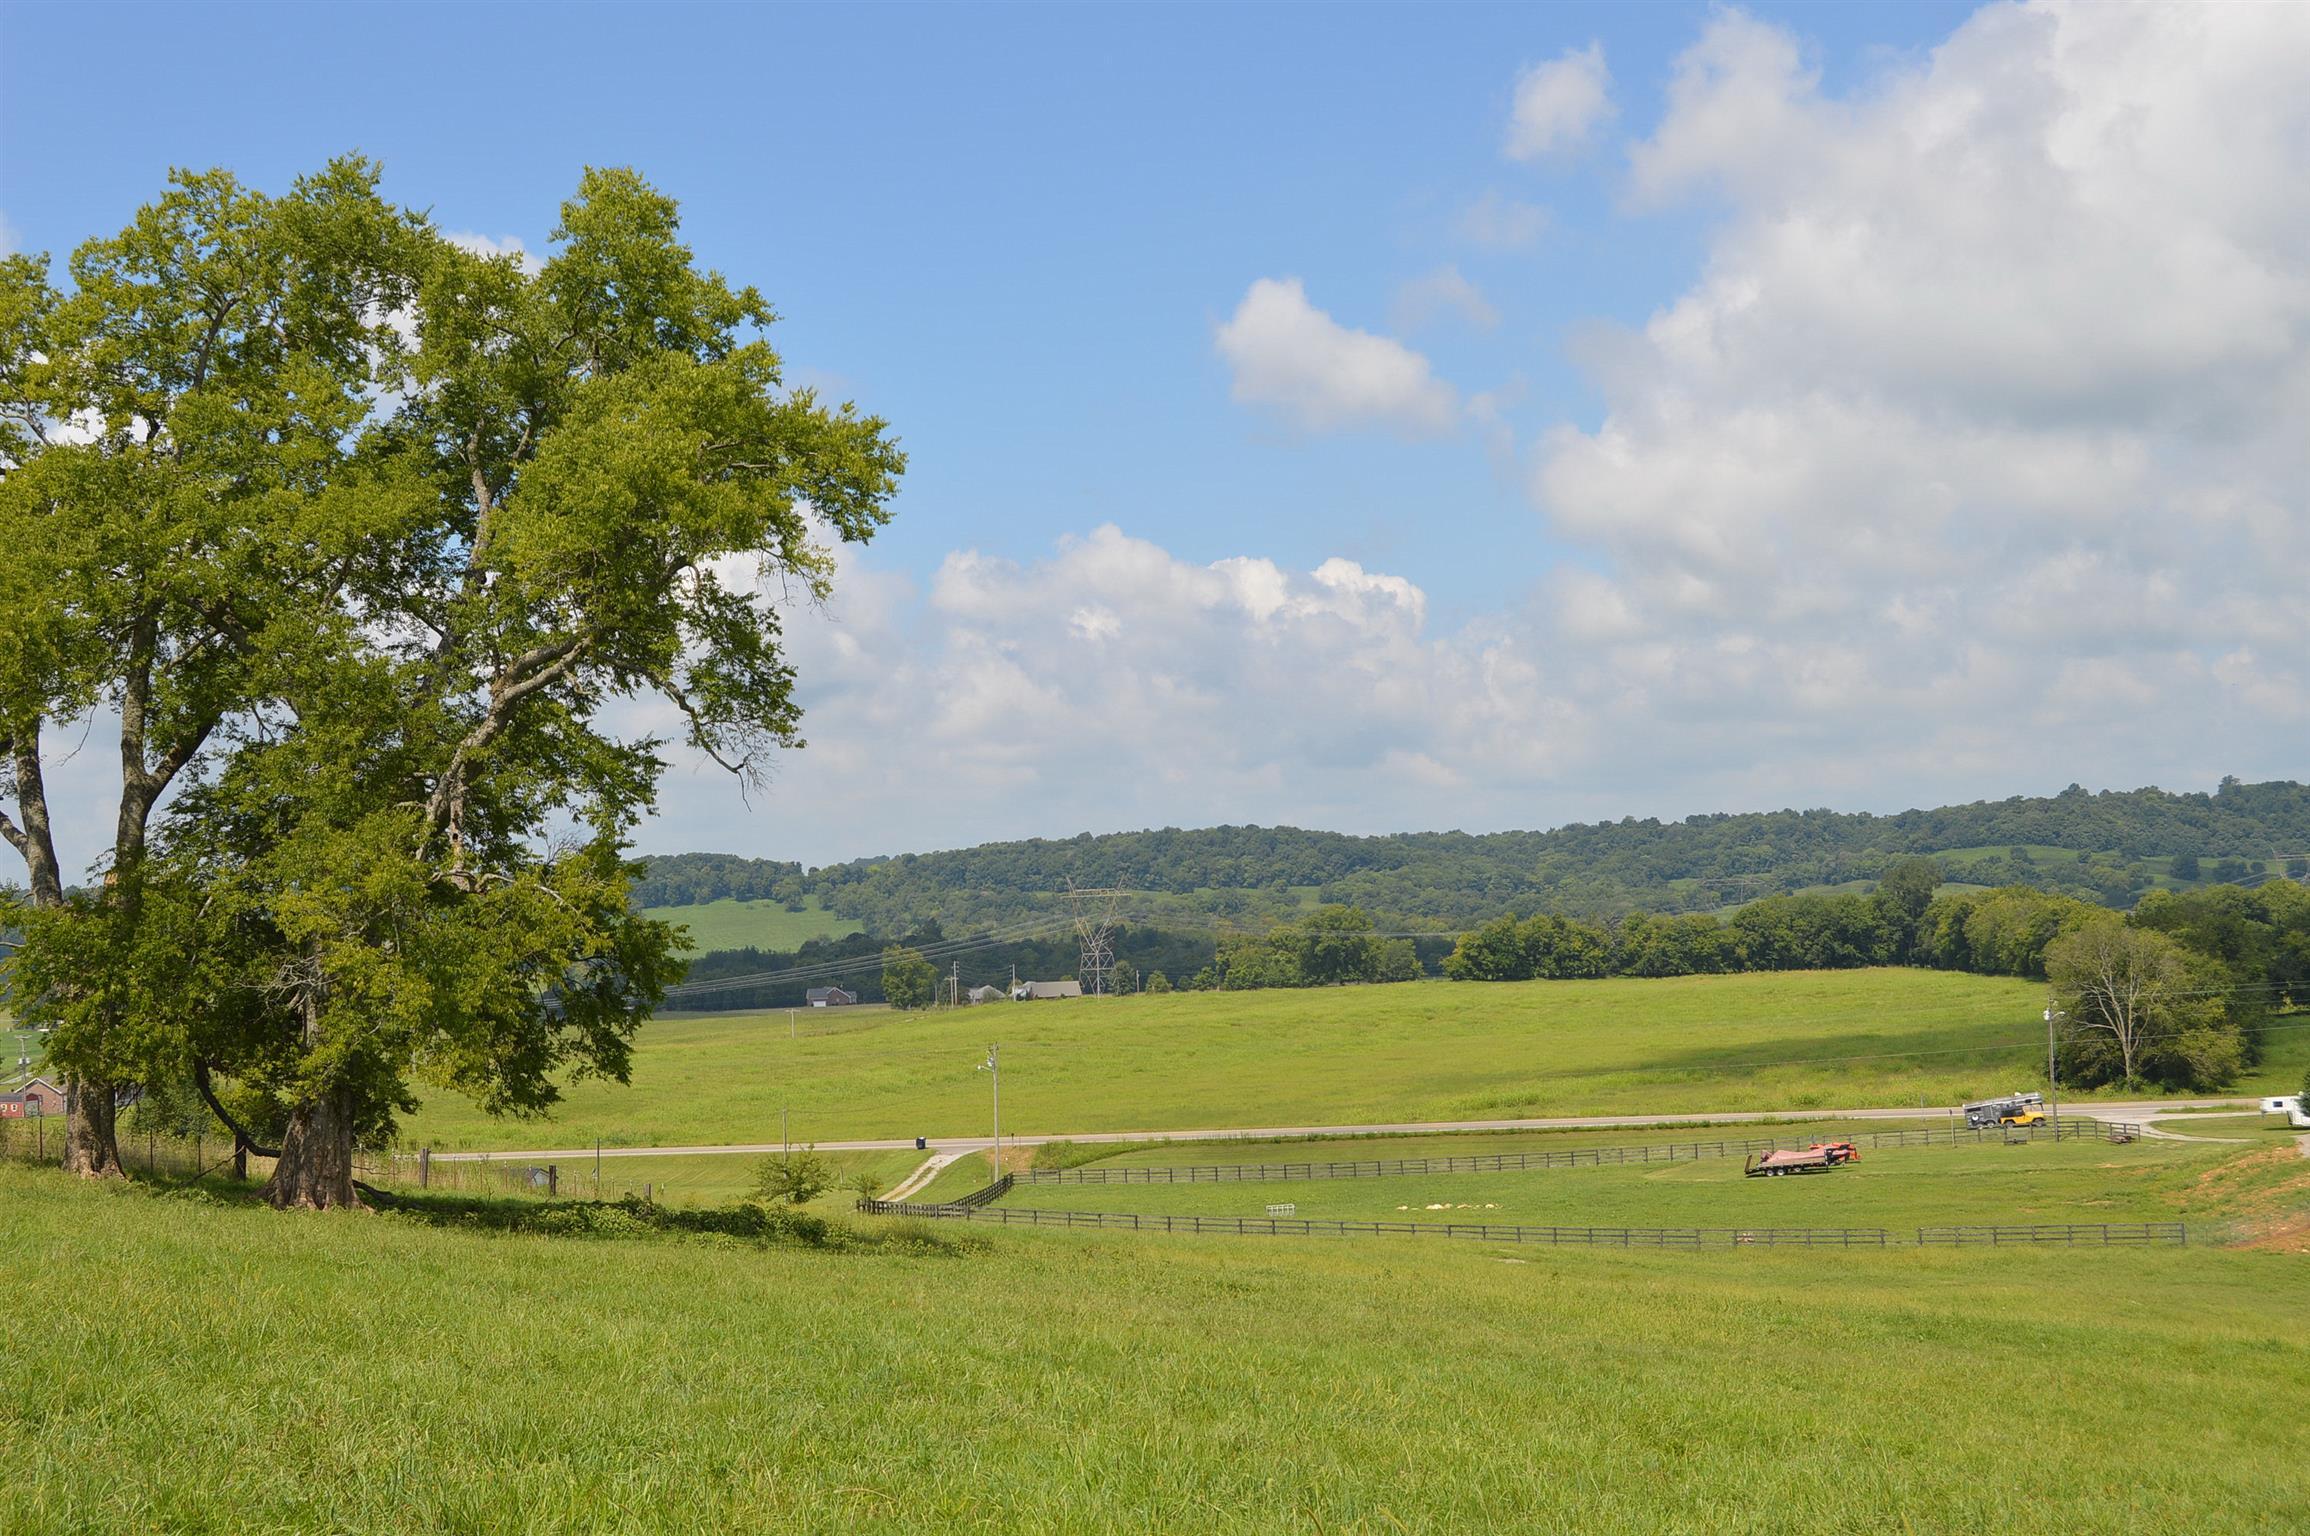 0 Pulaski Hwy, Cornersville, TN 37047 - Cornersville, TN real estate listing